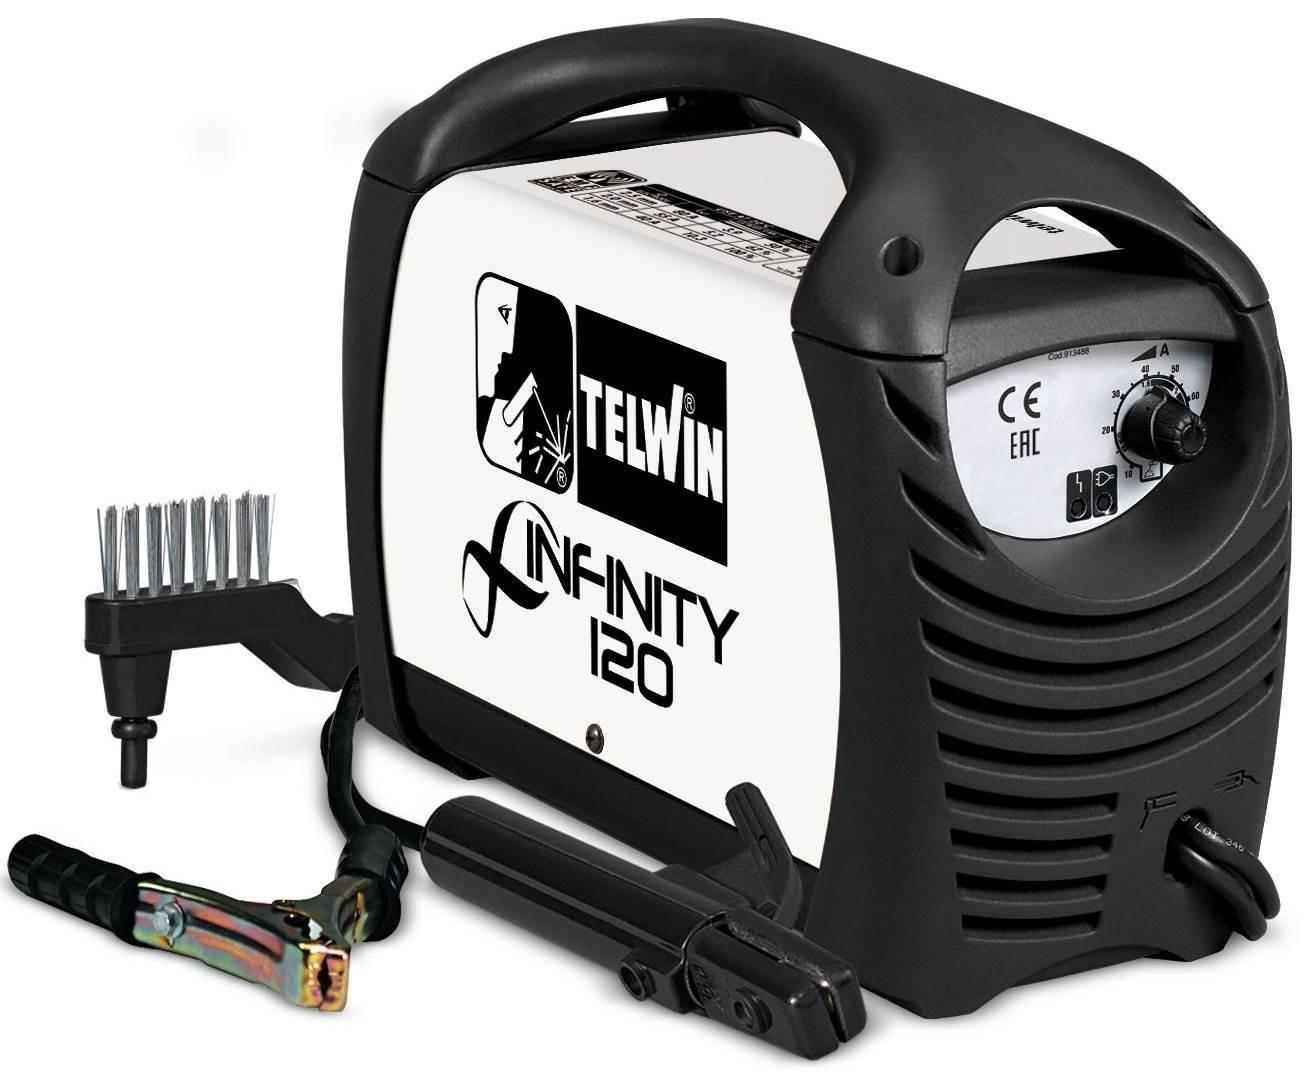 Сварочный аппарат Telwin INFINITY 120 230V ACD 816078